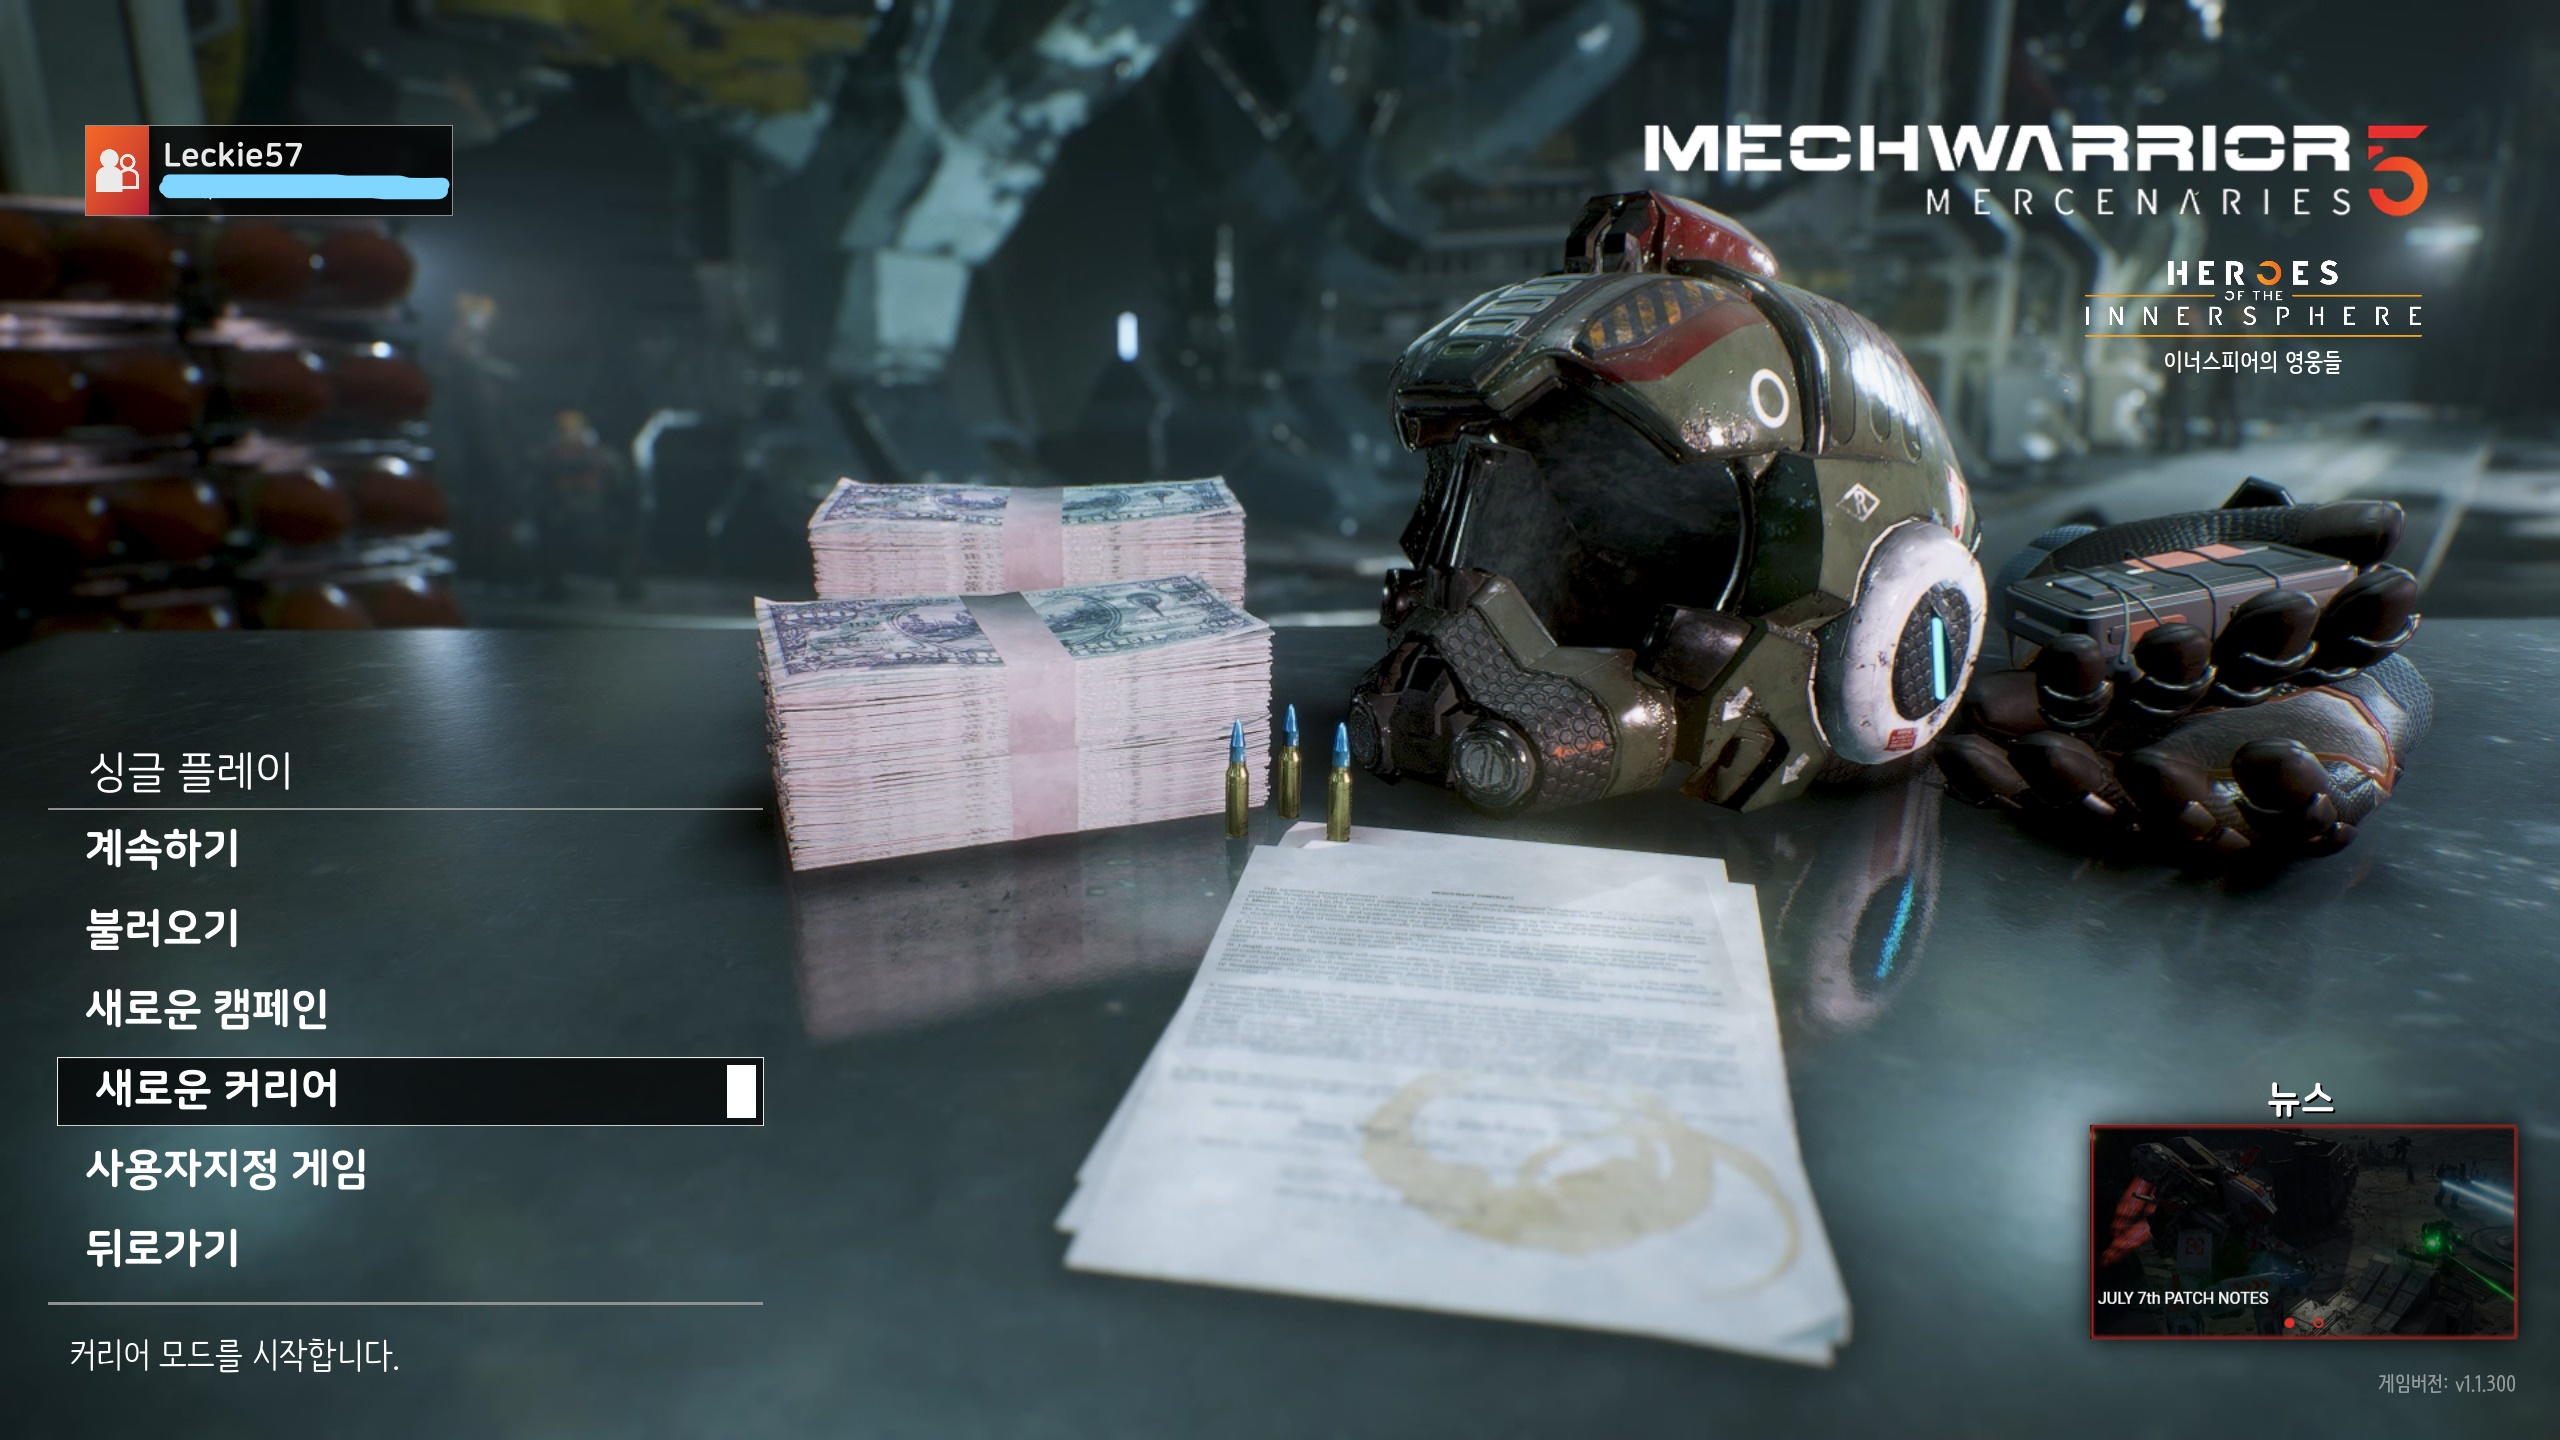 Mechwarrior 5  Mercenaries Screenshot 2021.08.01 - 20.46.54.58_LI.jpg